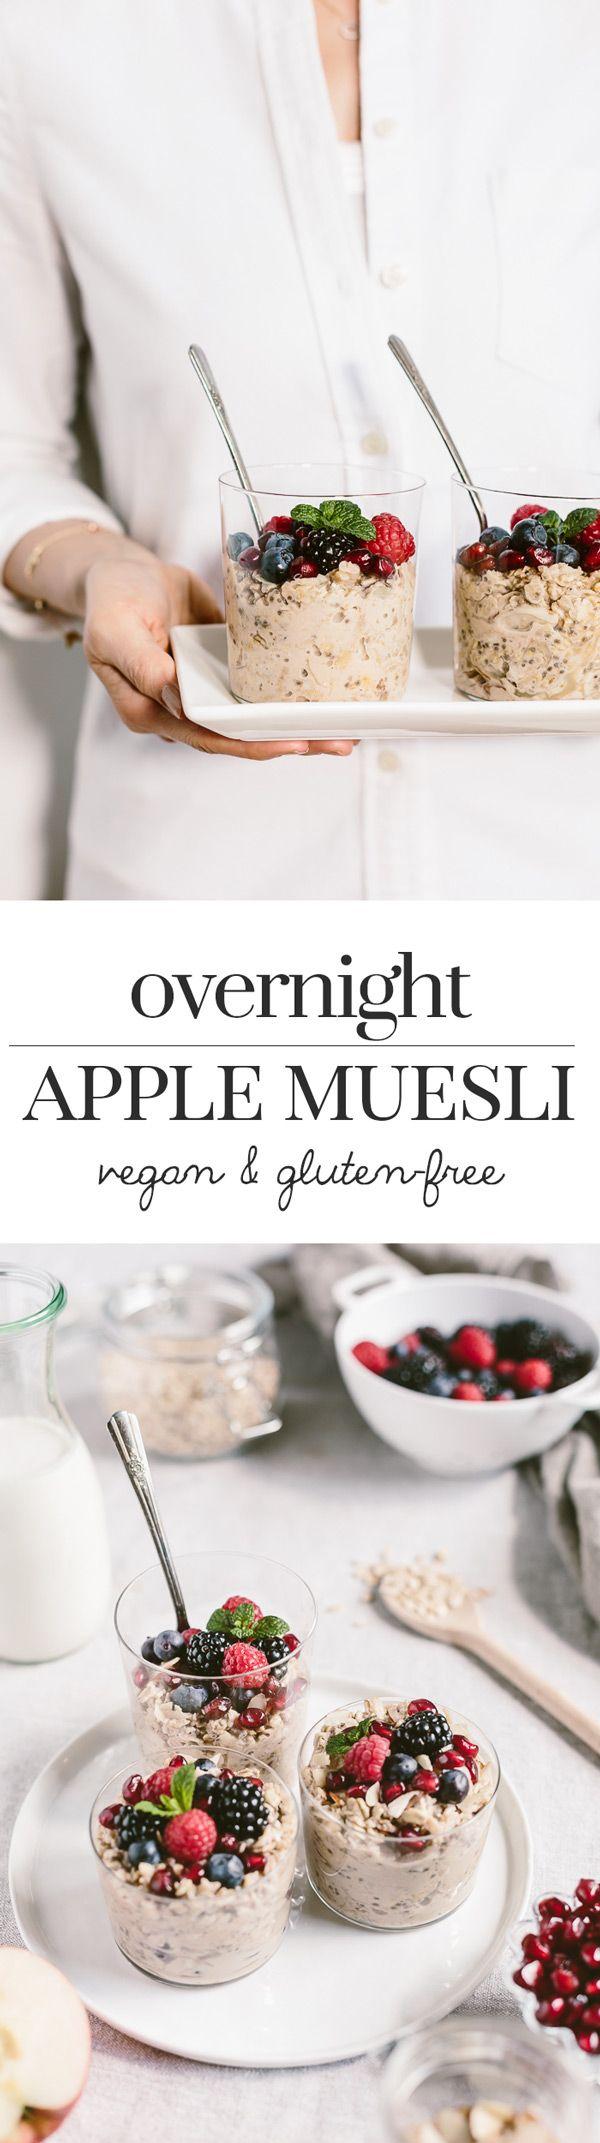 Overnight Apple Muesli - A vegan and gluten-free bircher muesli made with mixing shredded apples, almond milk, and almond yogurt.